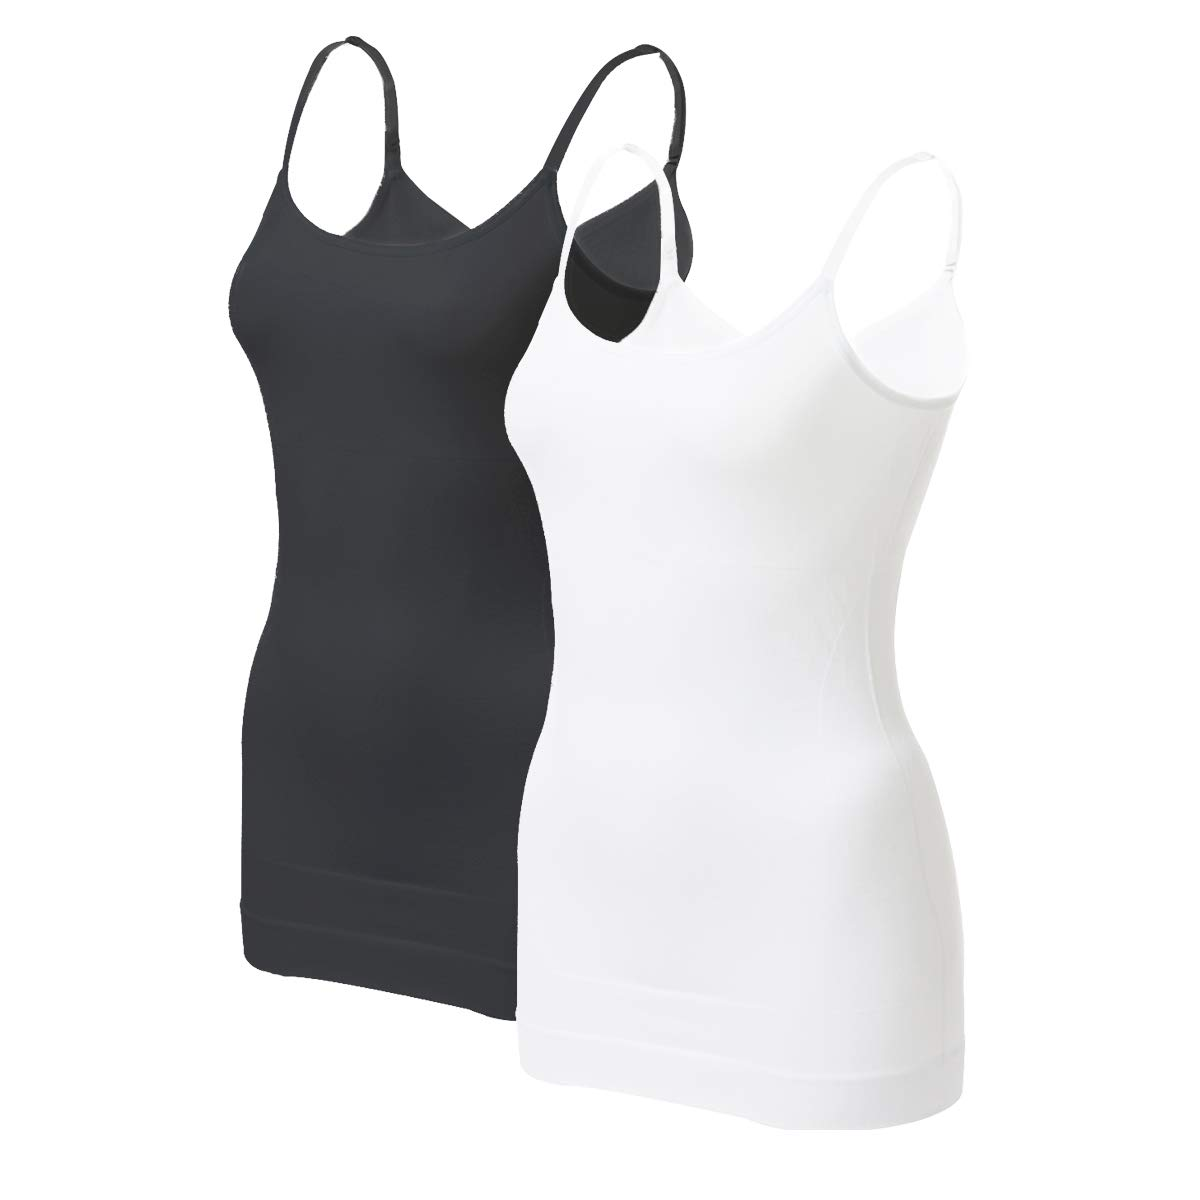 EUYZOU Women's Tummy Control Shapewear Tank Tops - Seamless Body Shaper Compression Top